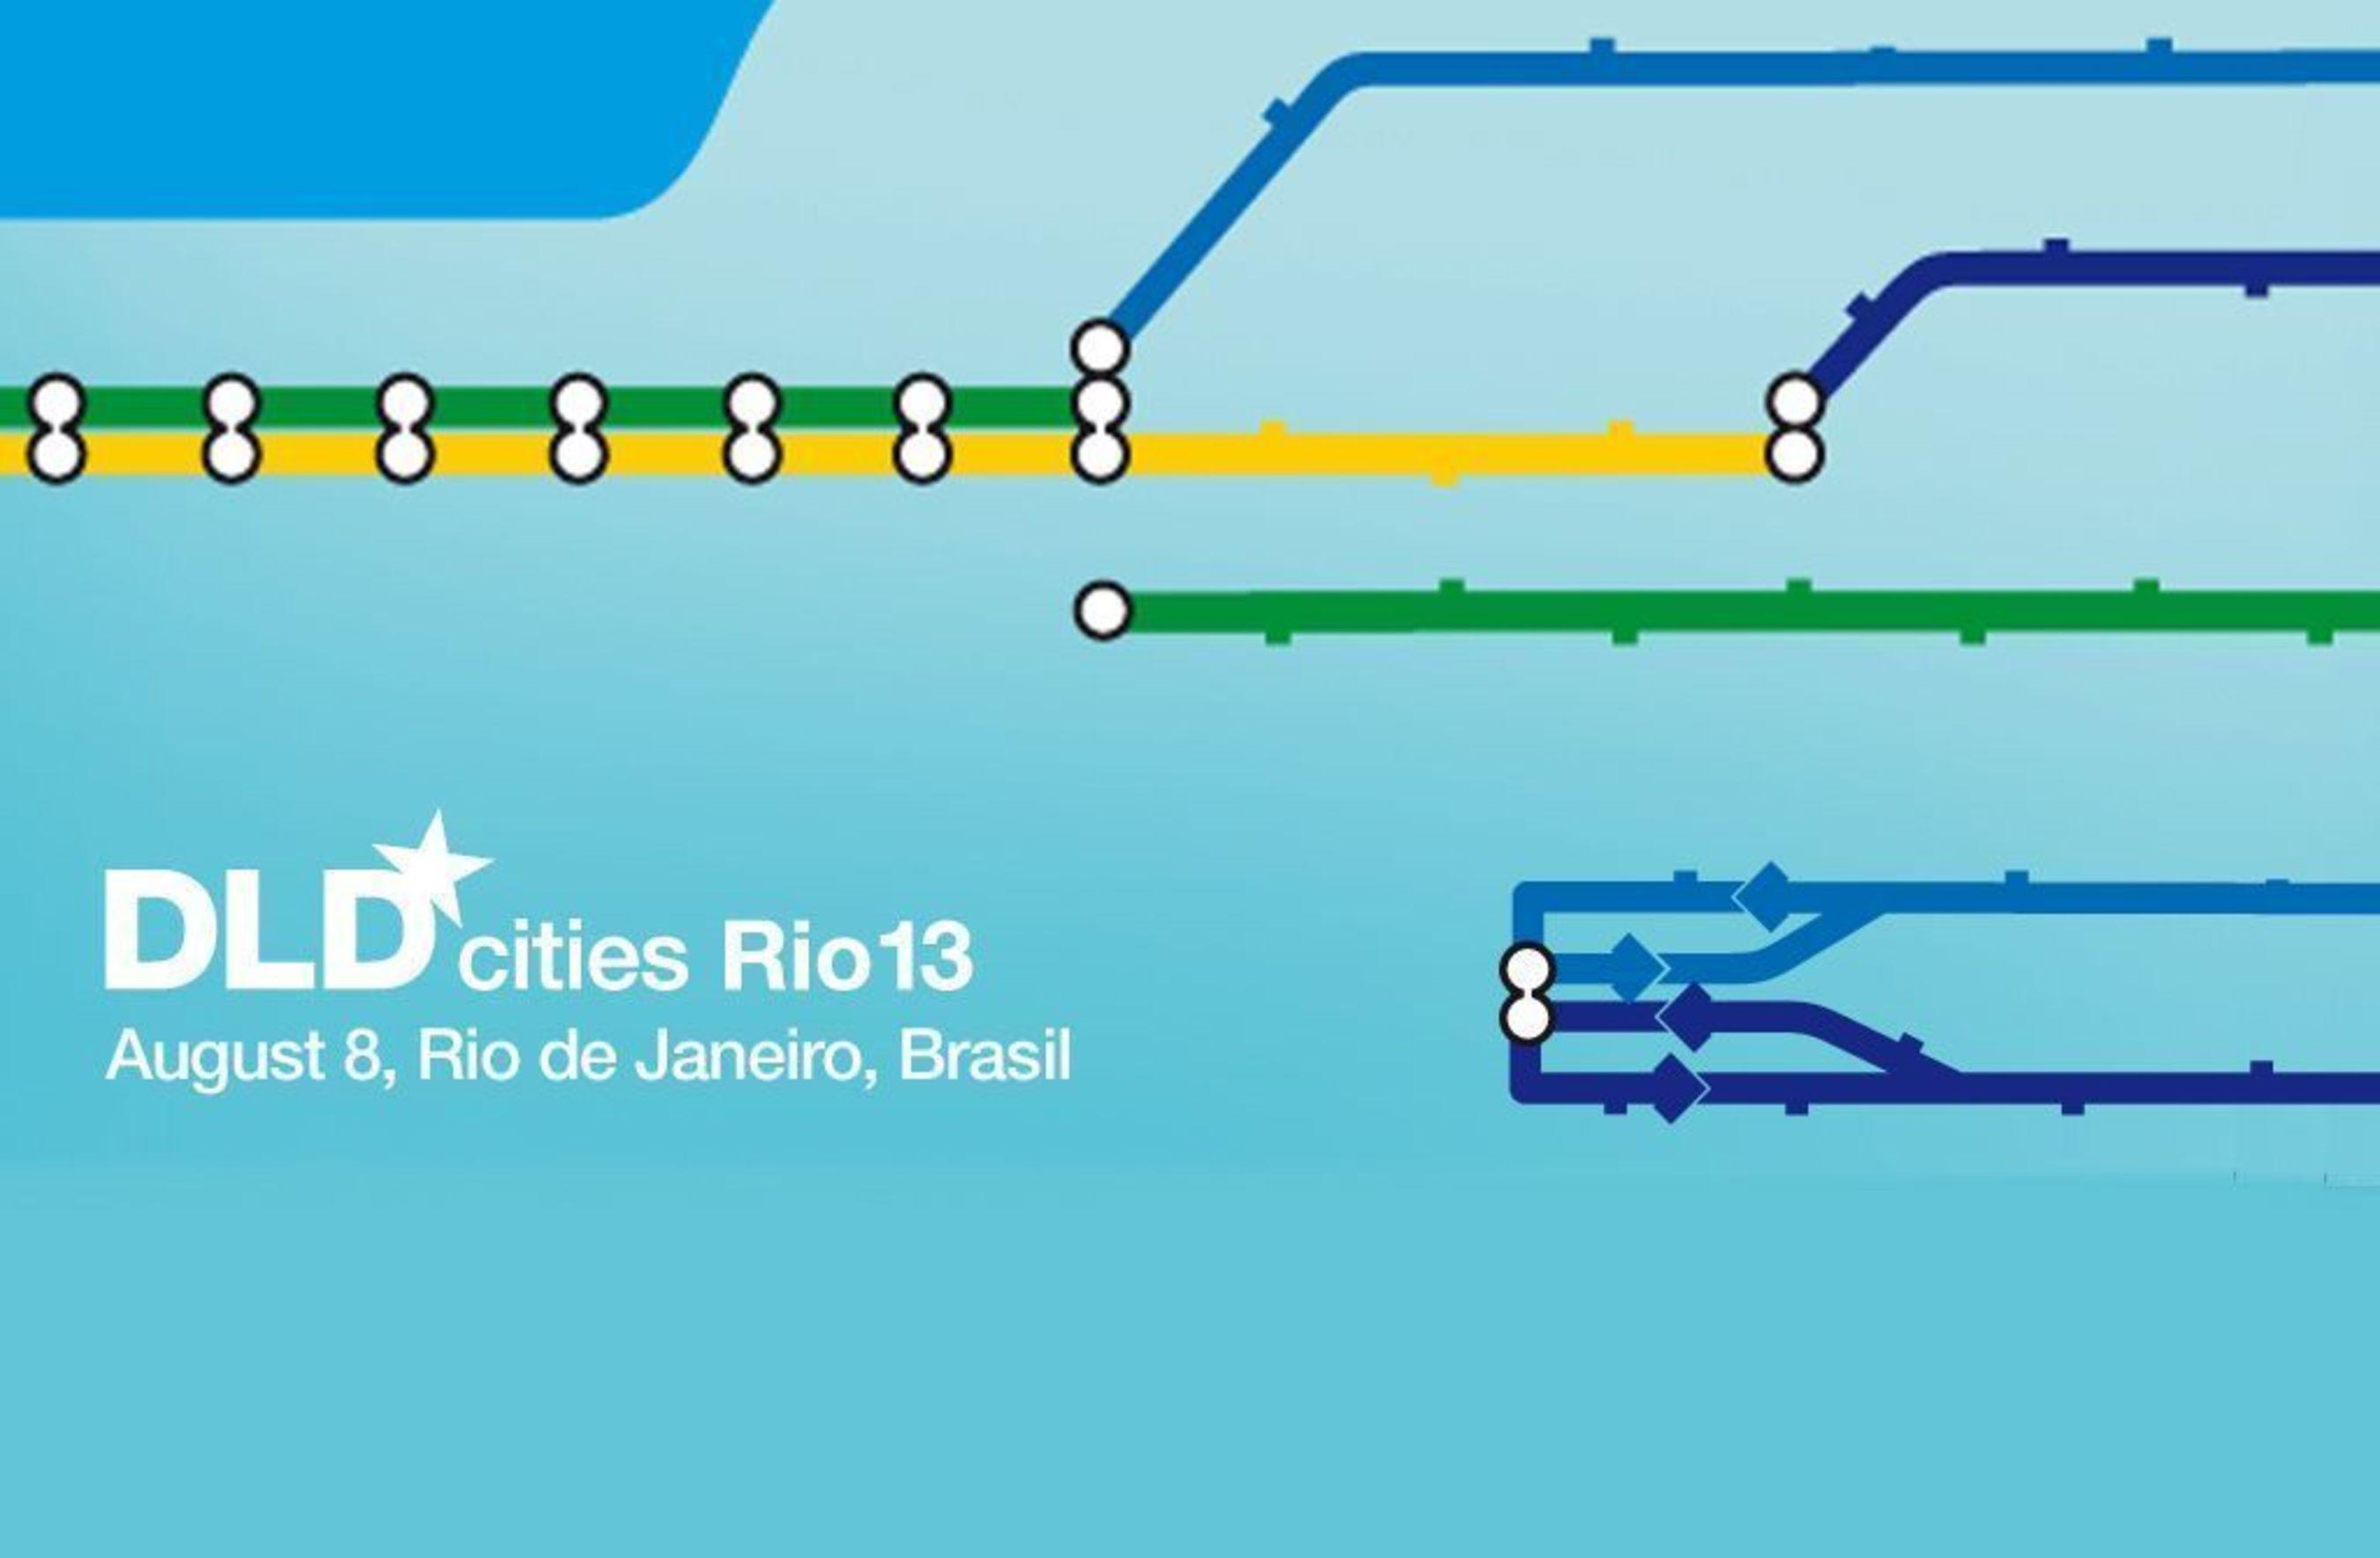 DLDcities Rio13 logo (PRNewsFoto/Hubert Burda Media)